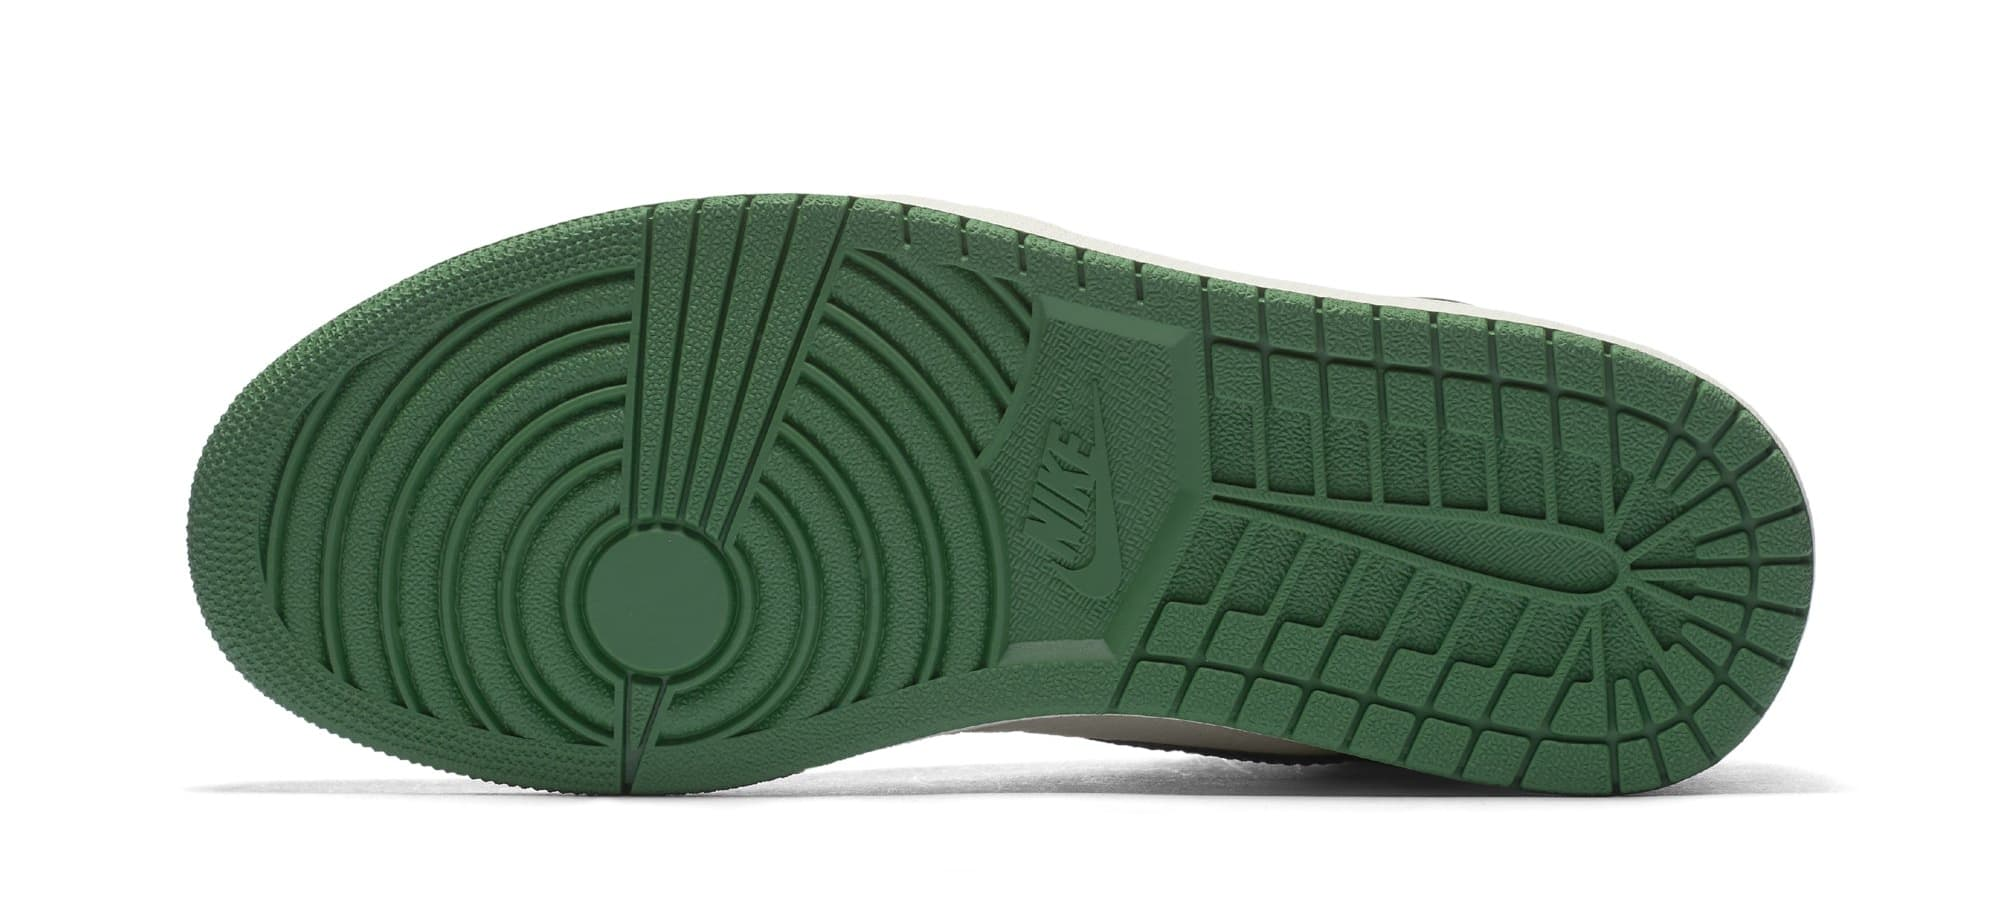 Air Jordan 1 High OG 'Pine Green' 555088-032 (Sole)